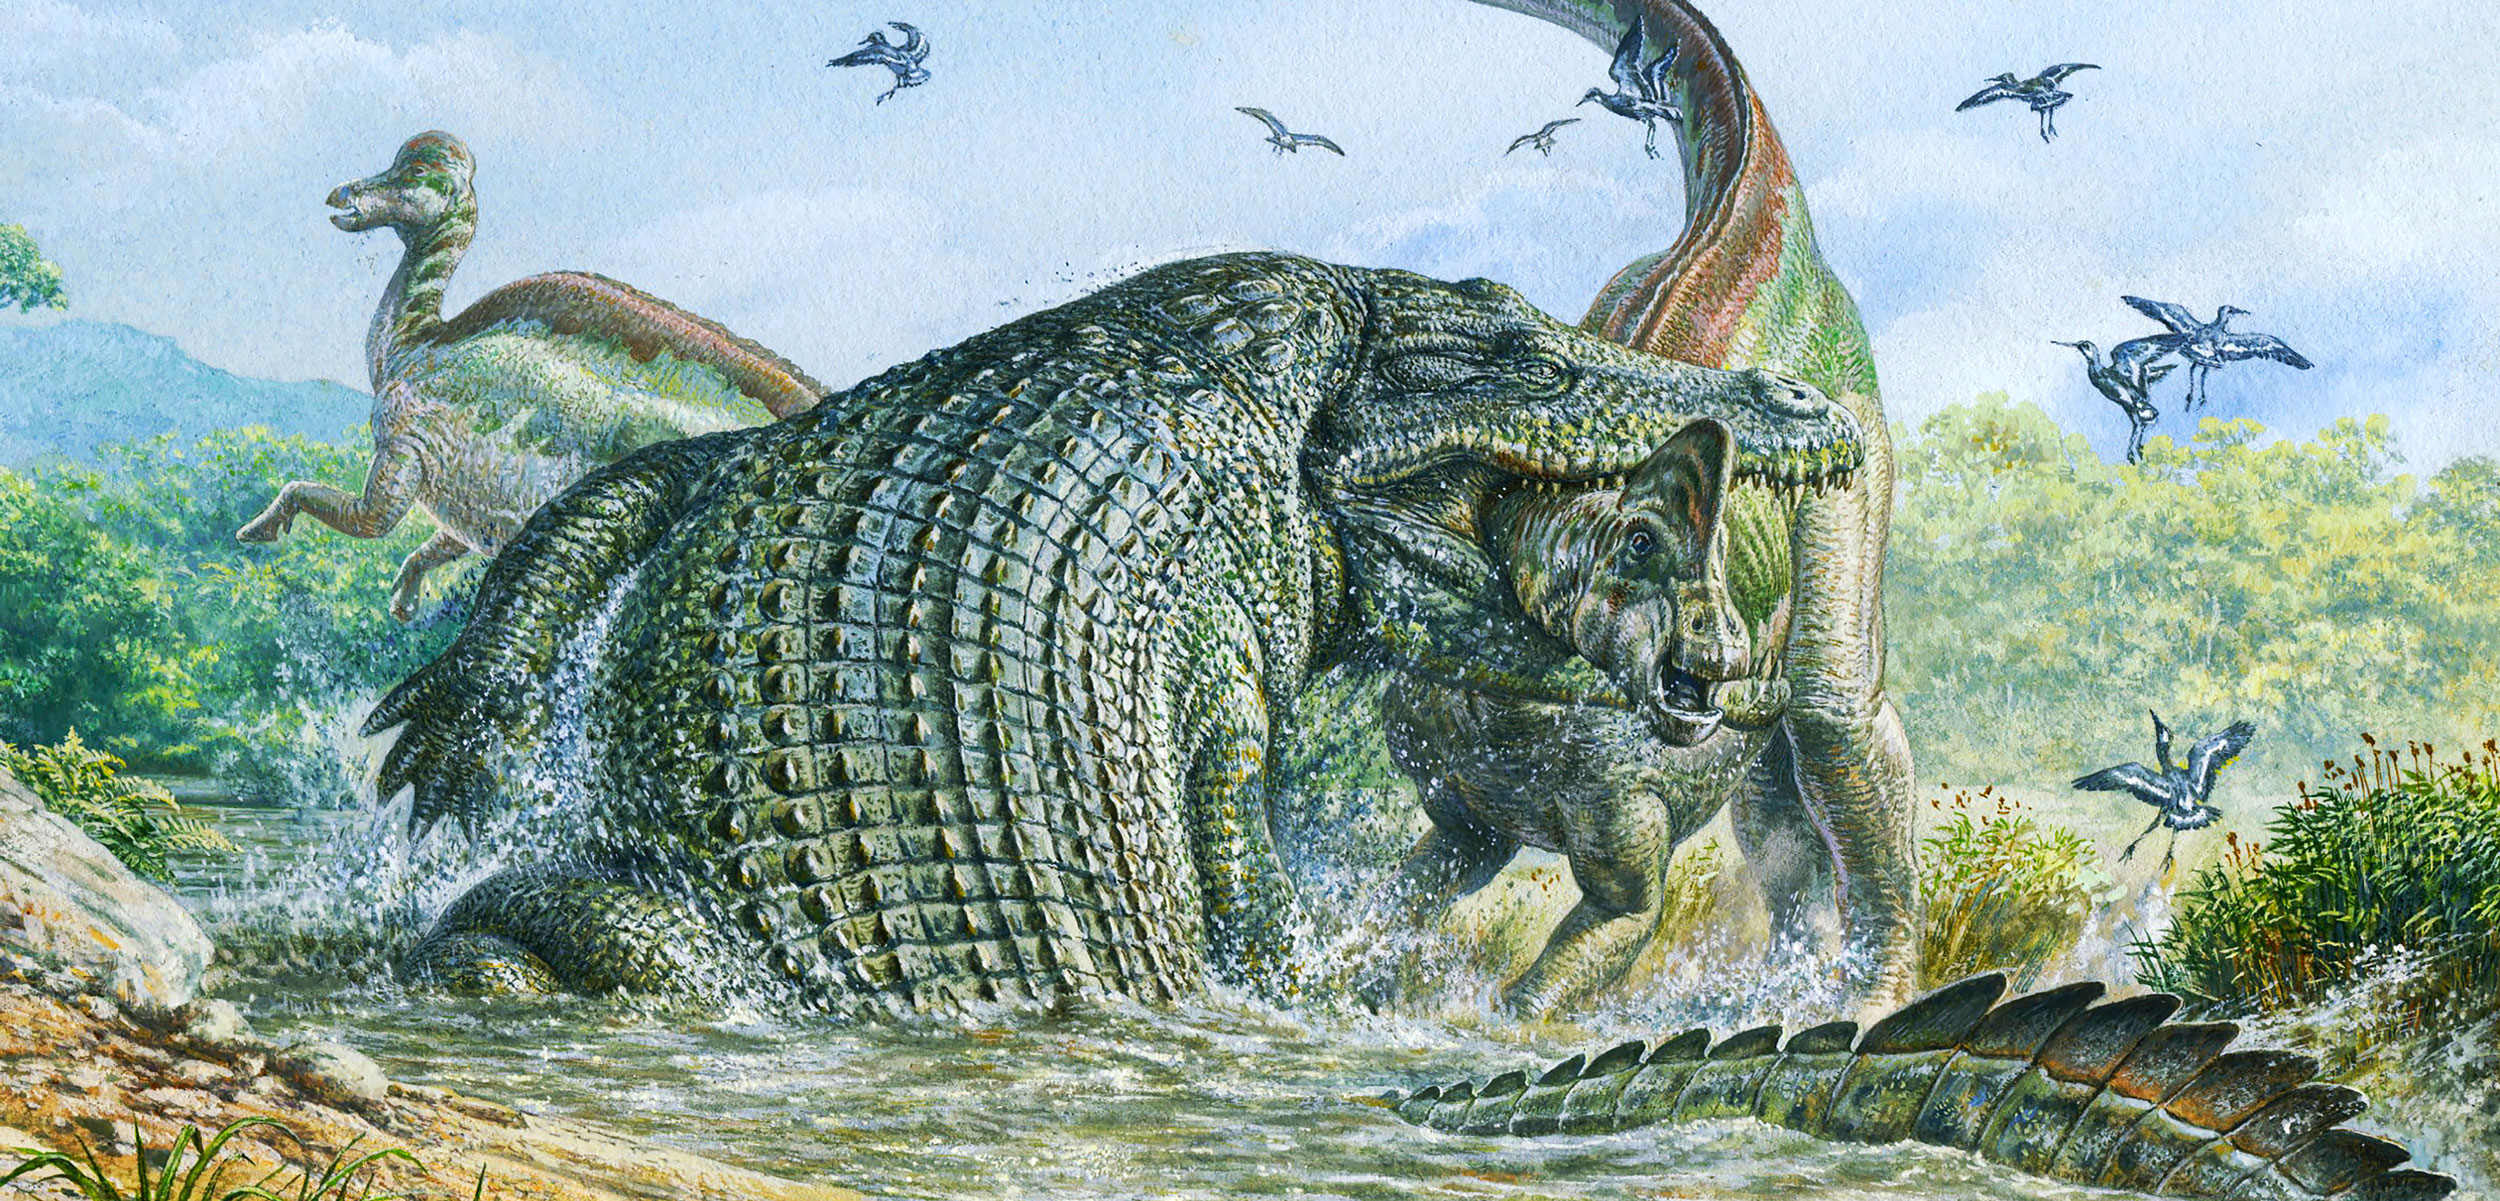 Deinosuchus reptile attacking a dinosaur